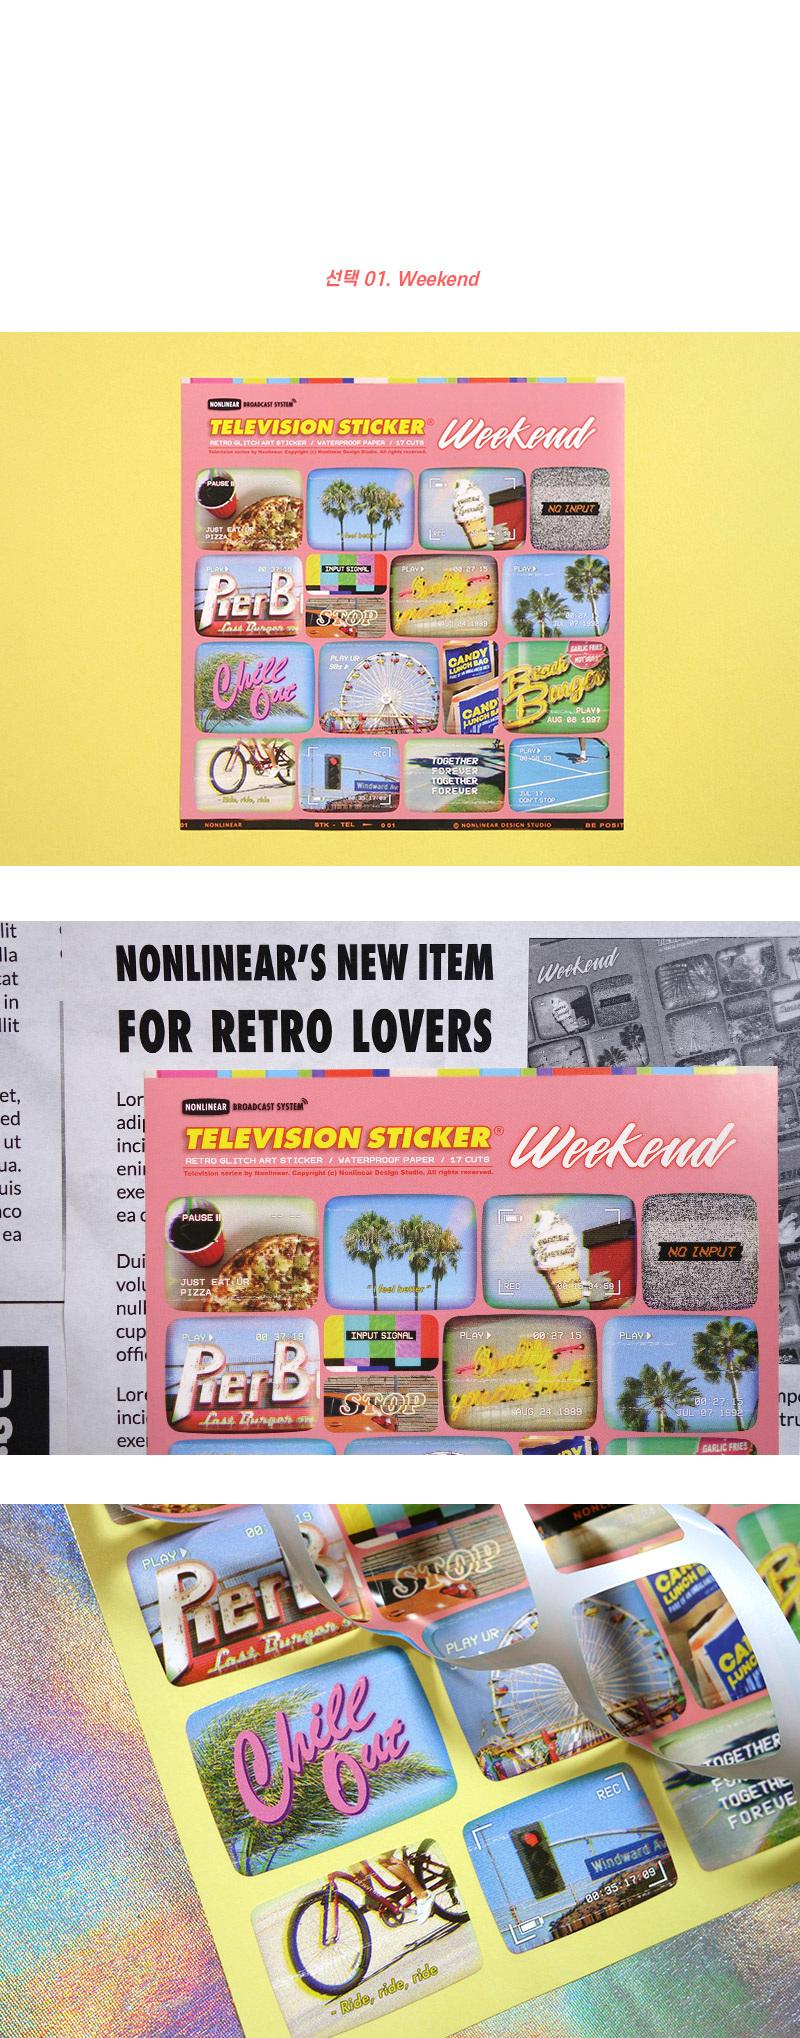 Television Sticker - 비선형, 3,500원, 스티커, 디자인스티커